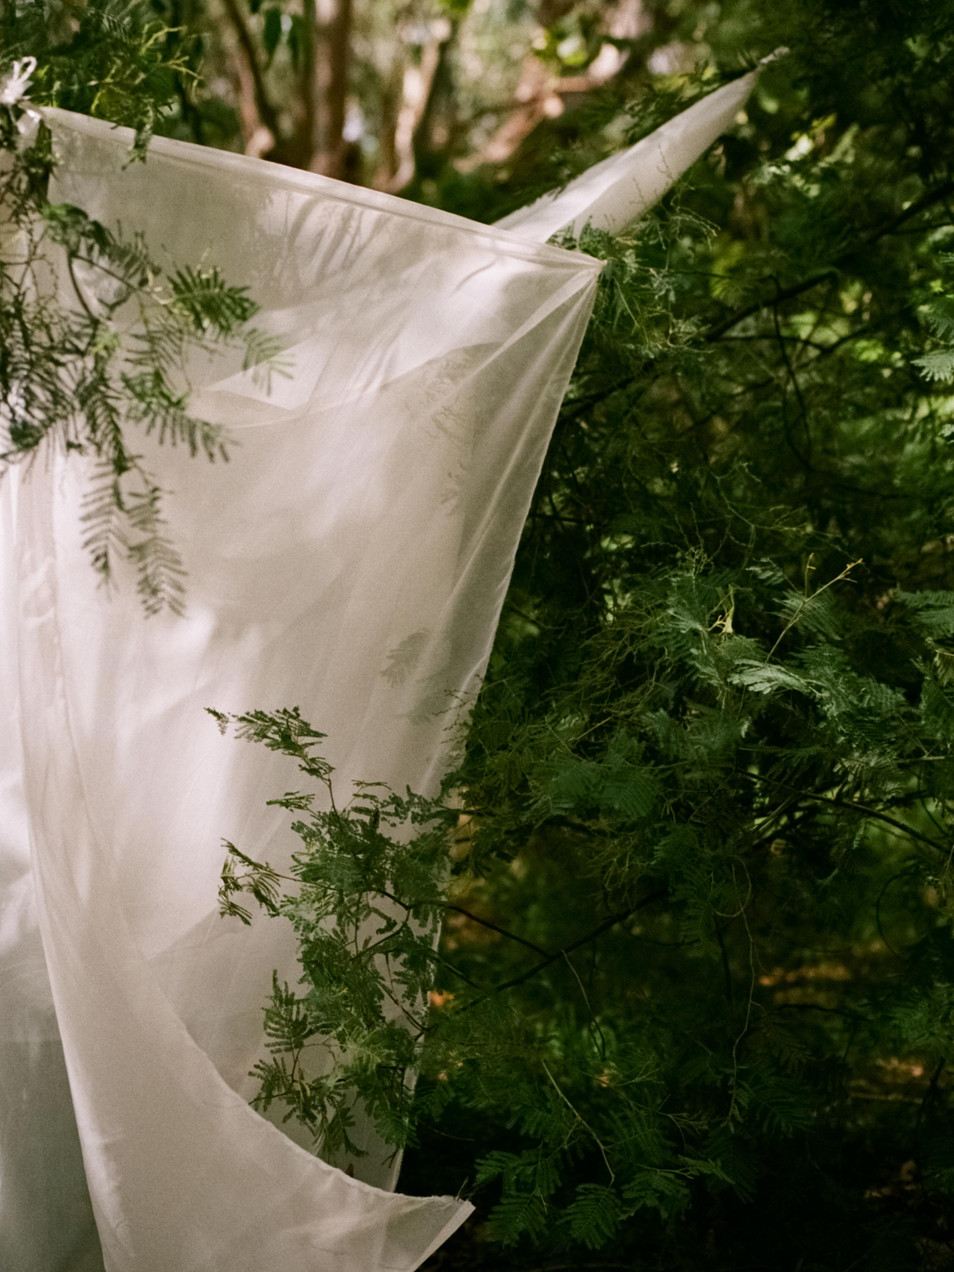 Rachel-Jayne-Mackay_Fabric-Trees_03.jpg